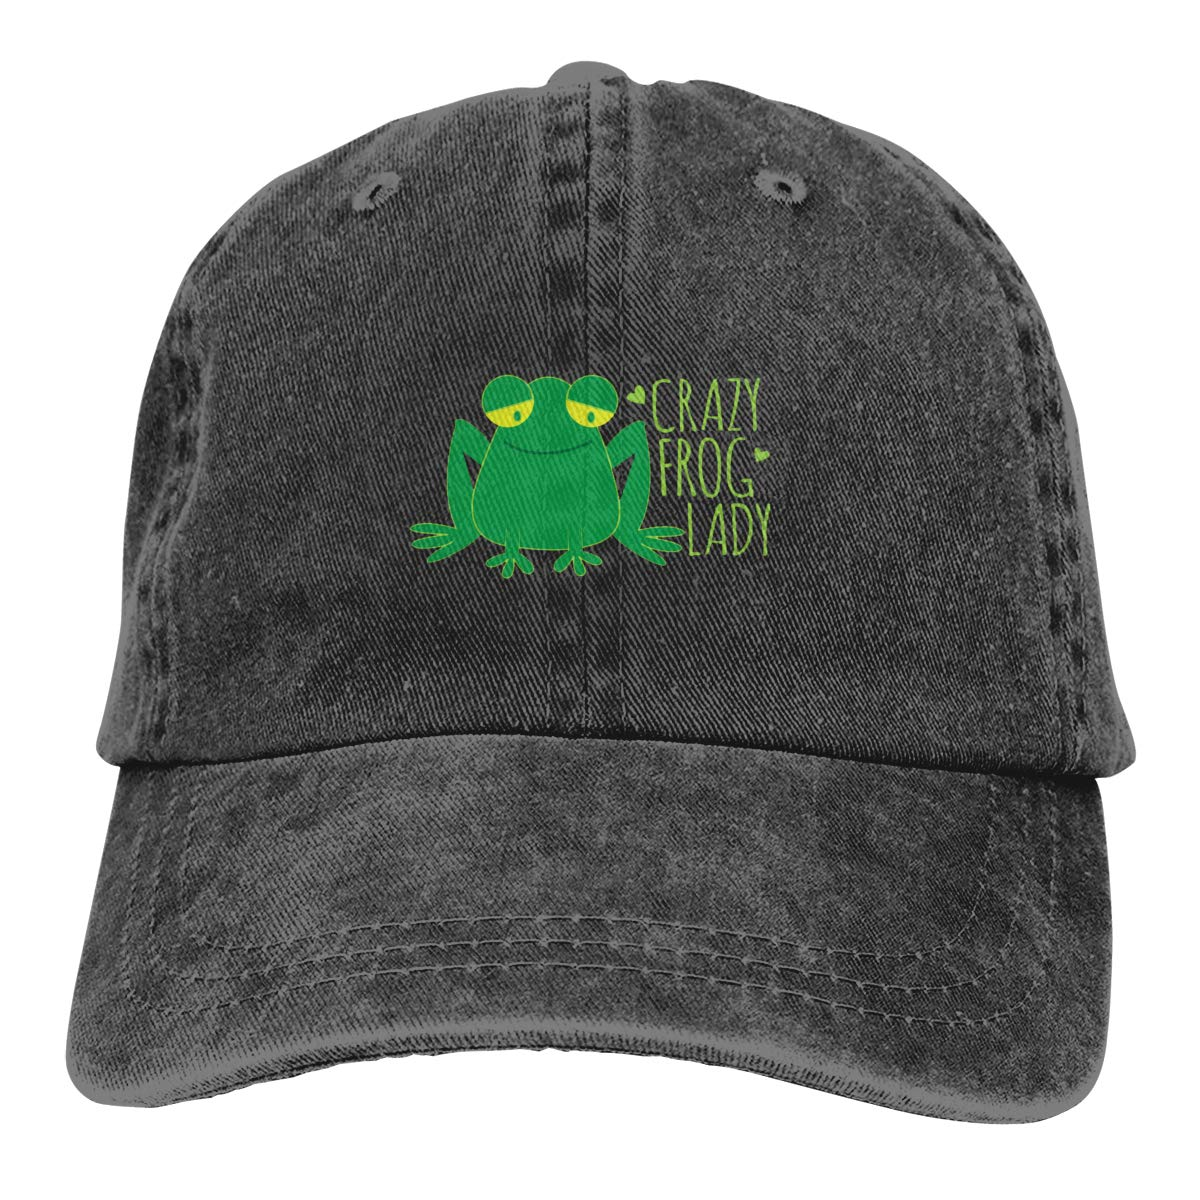 Sajfirlug Crazy Frog Lady Fashion Adjustable Cowboy Cap Denim Hat for Women and Men